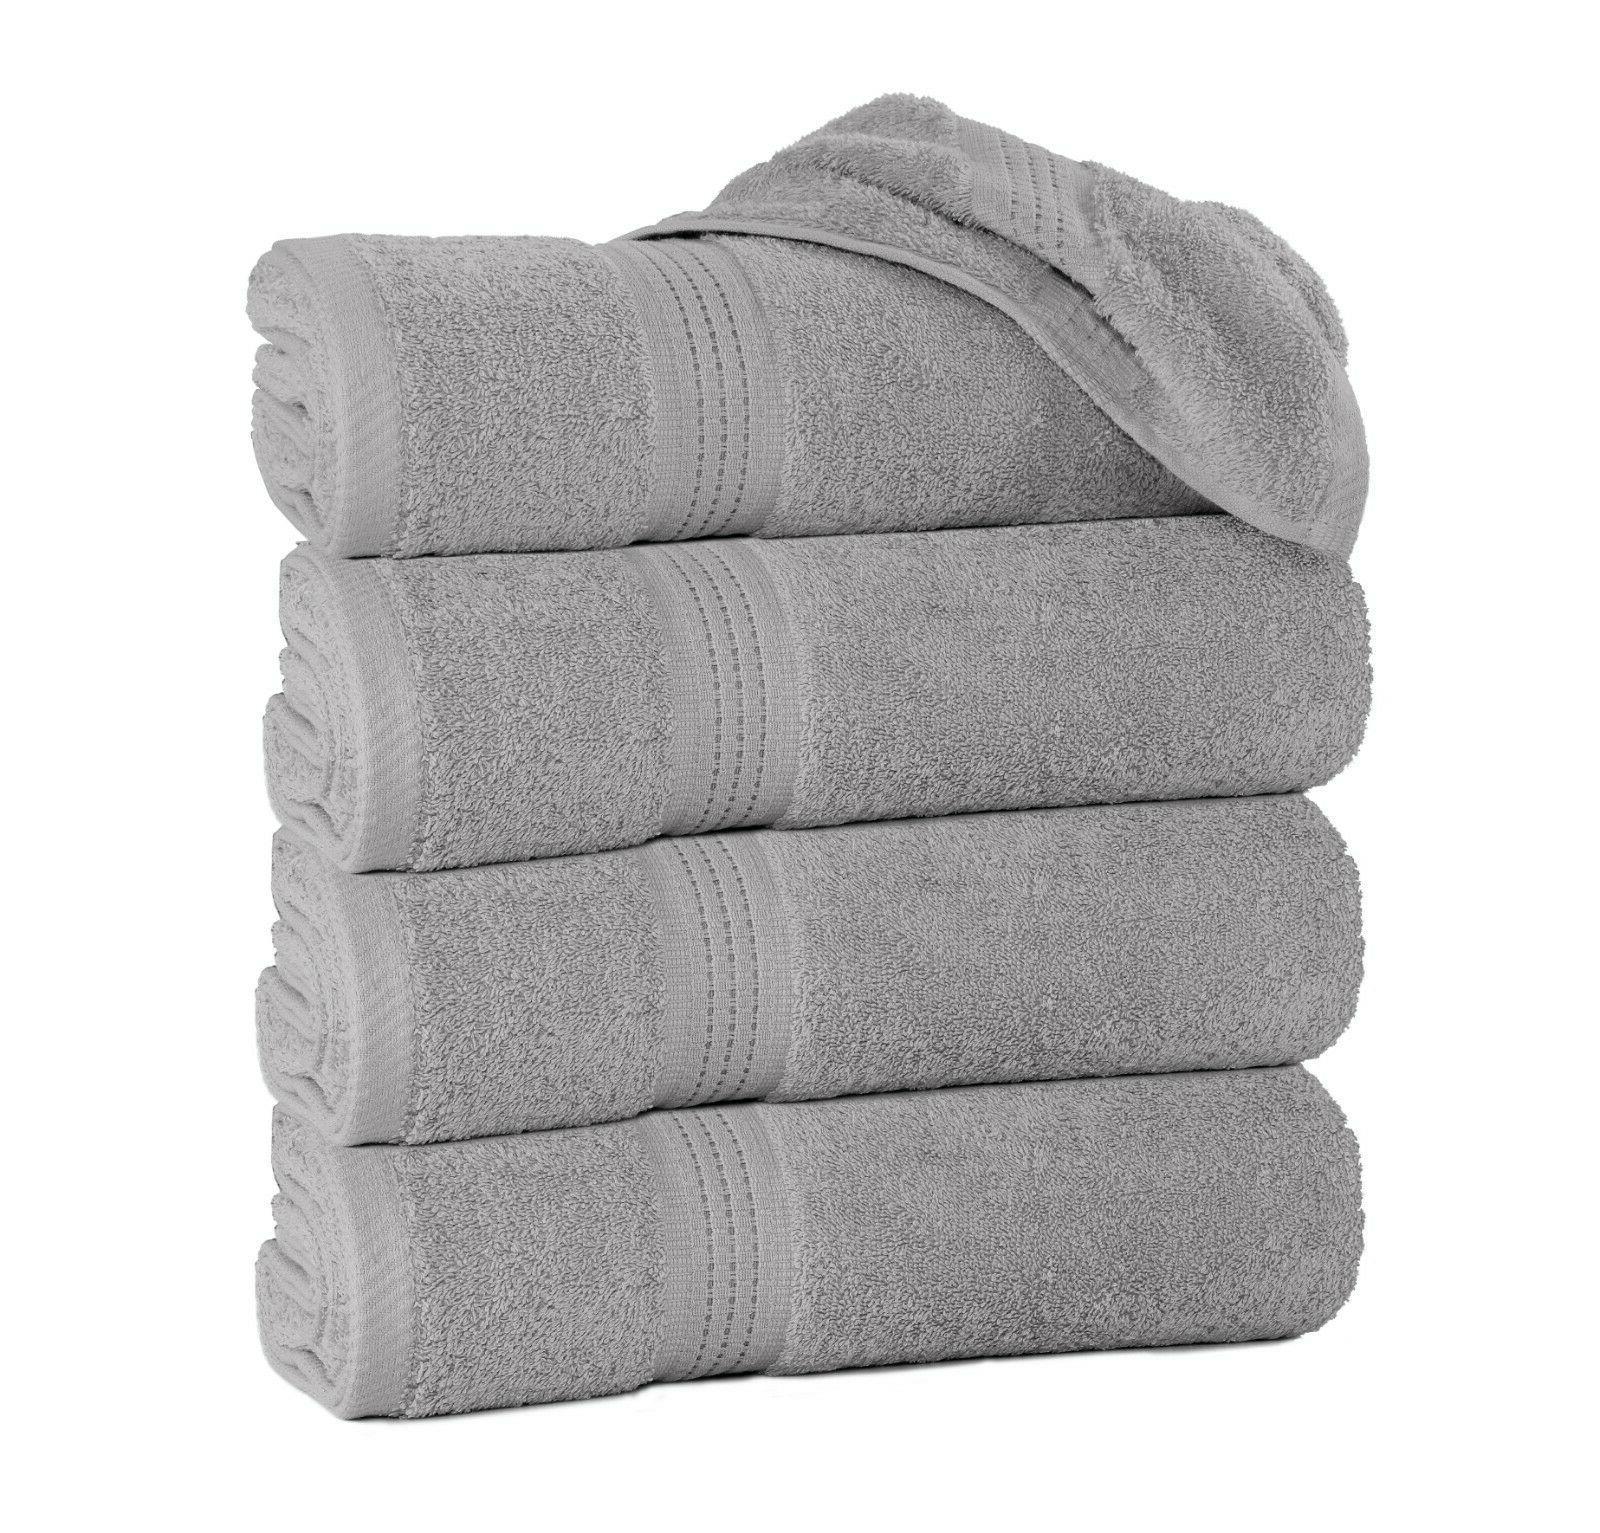 grey large bath towels packs sets 100